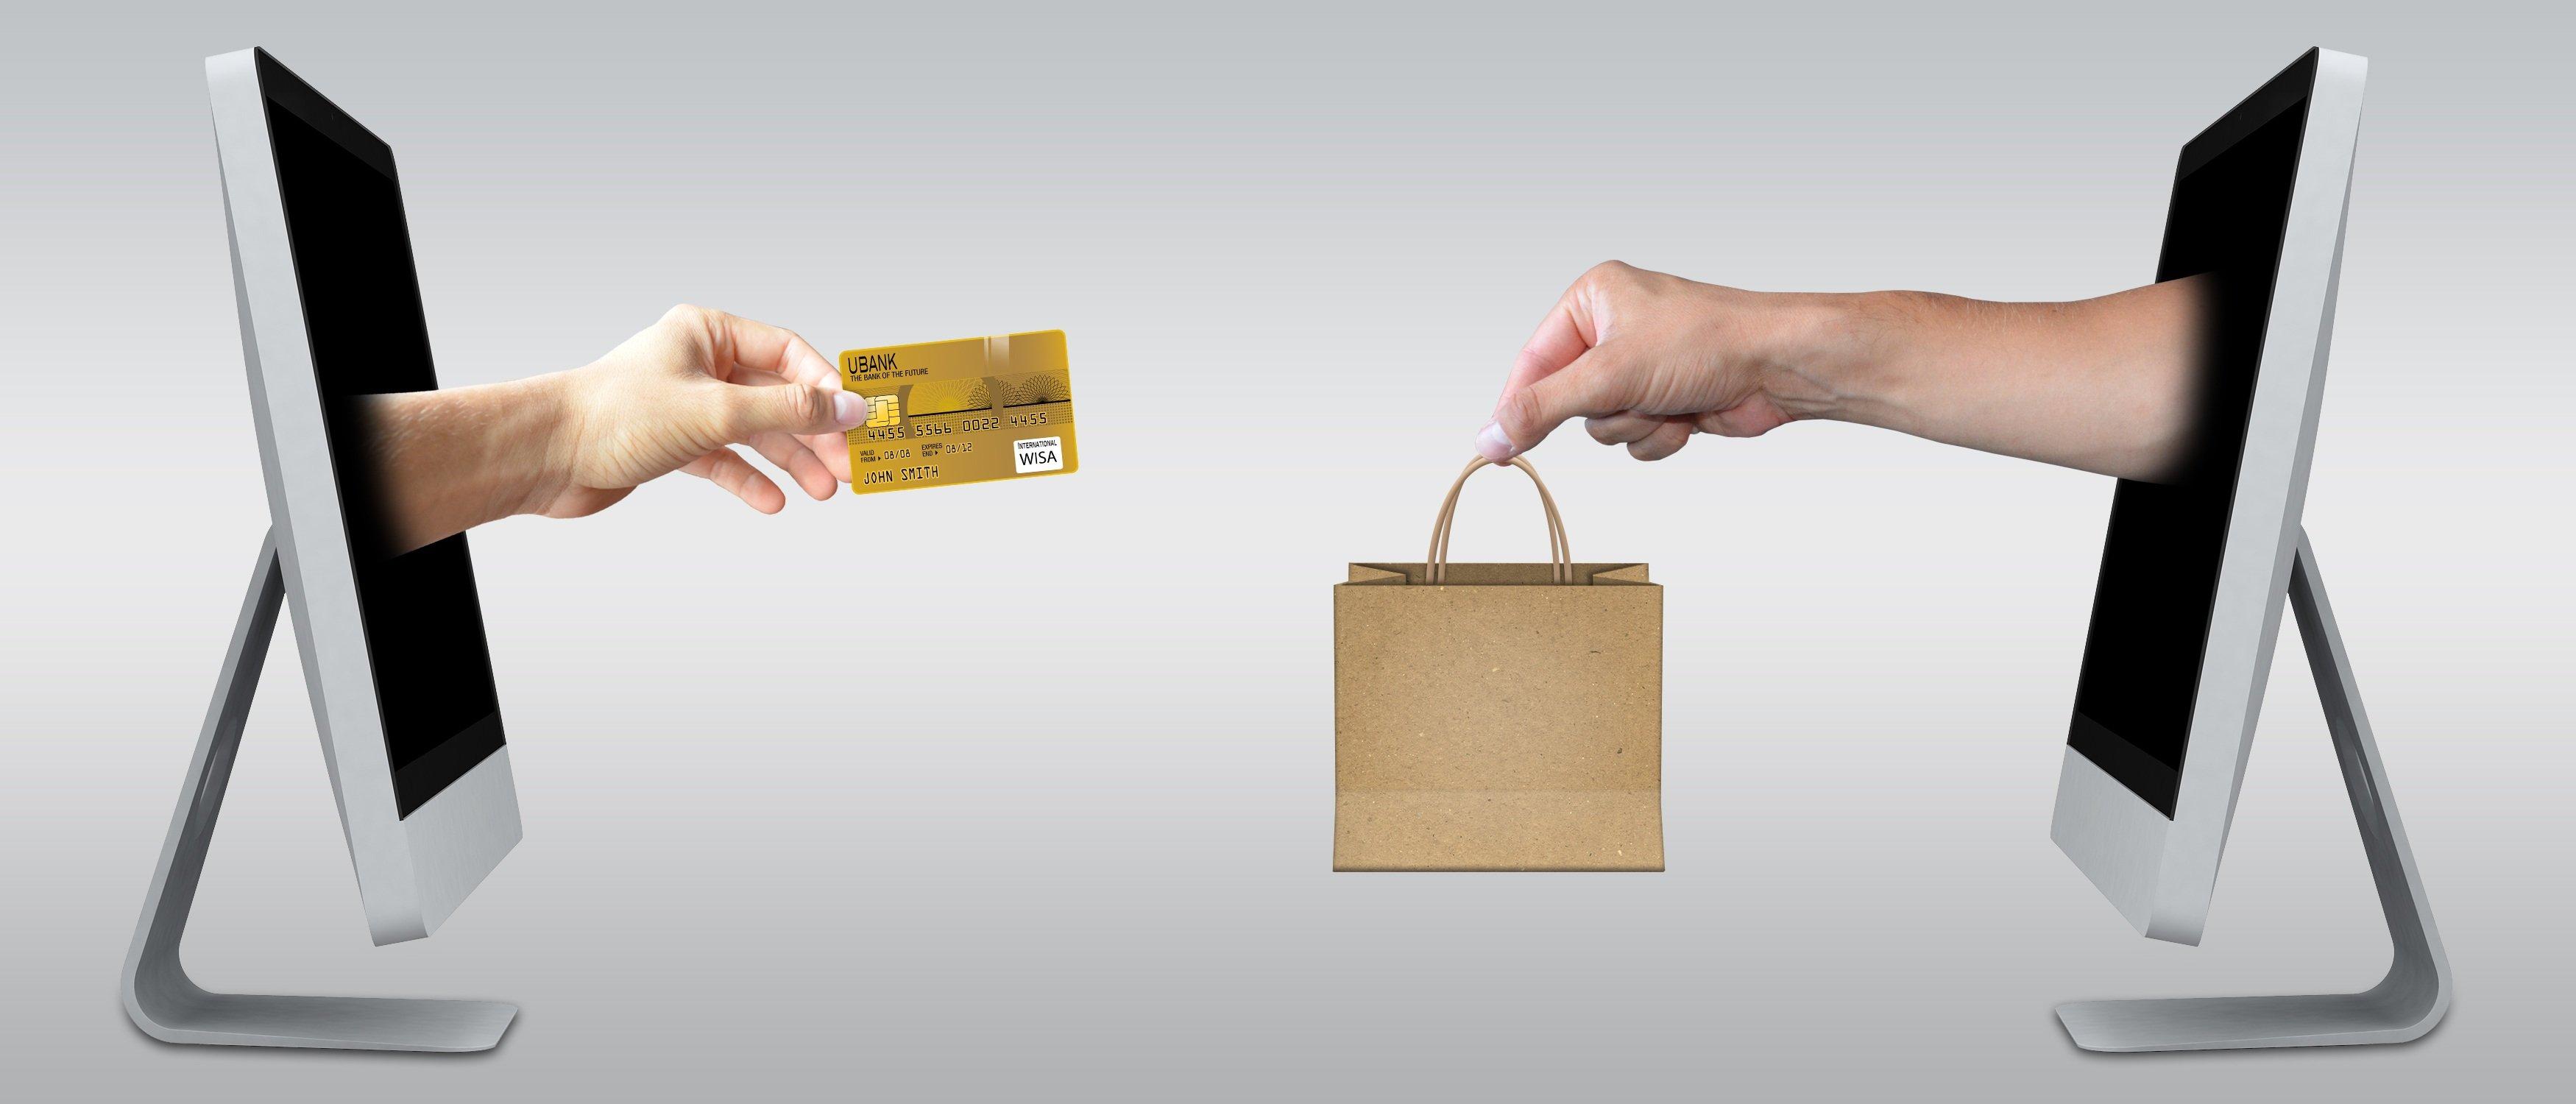 Image illustrating online purchase